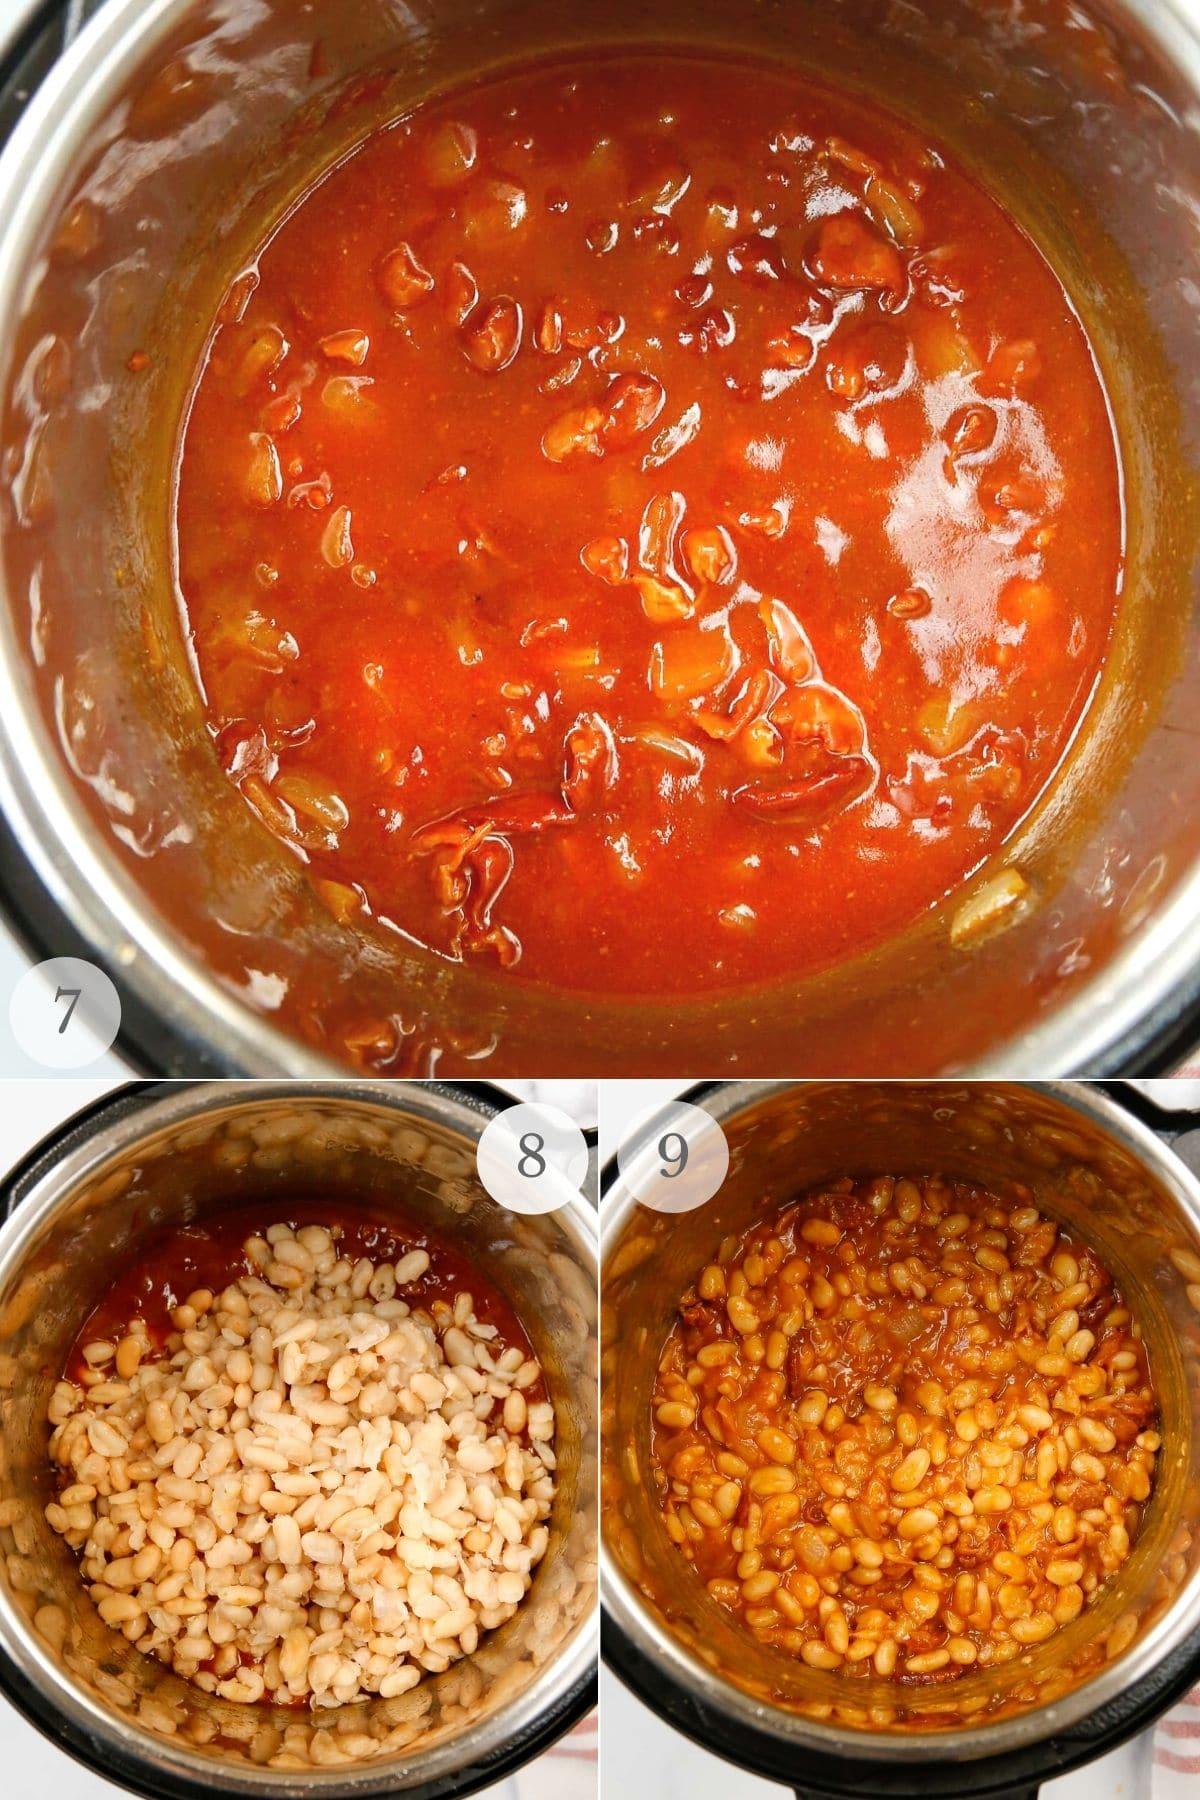 instant pot baked beans recipe steps 7-9